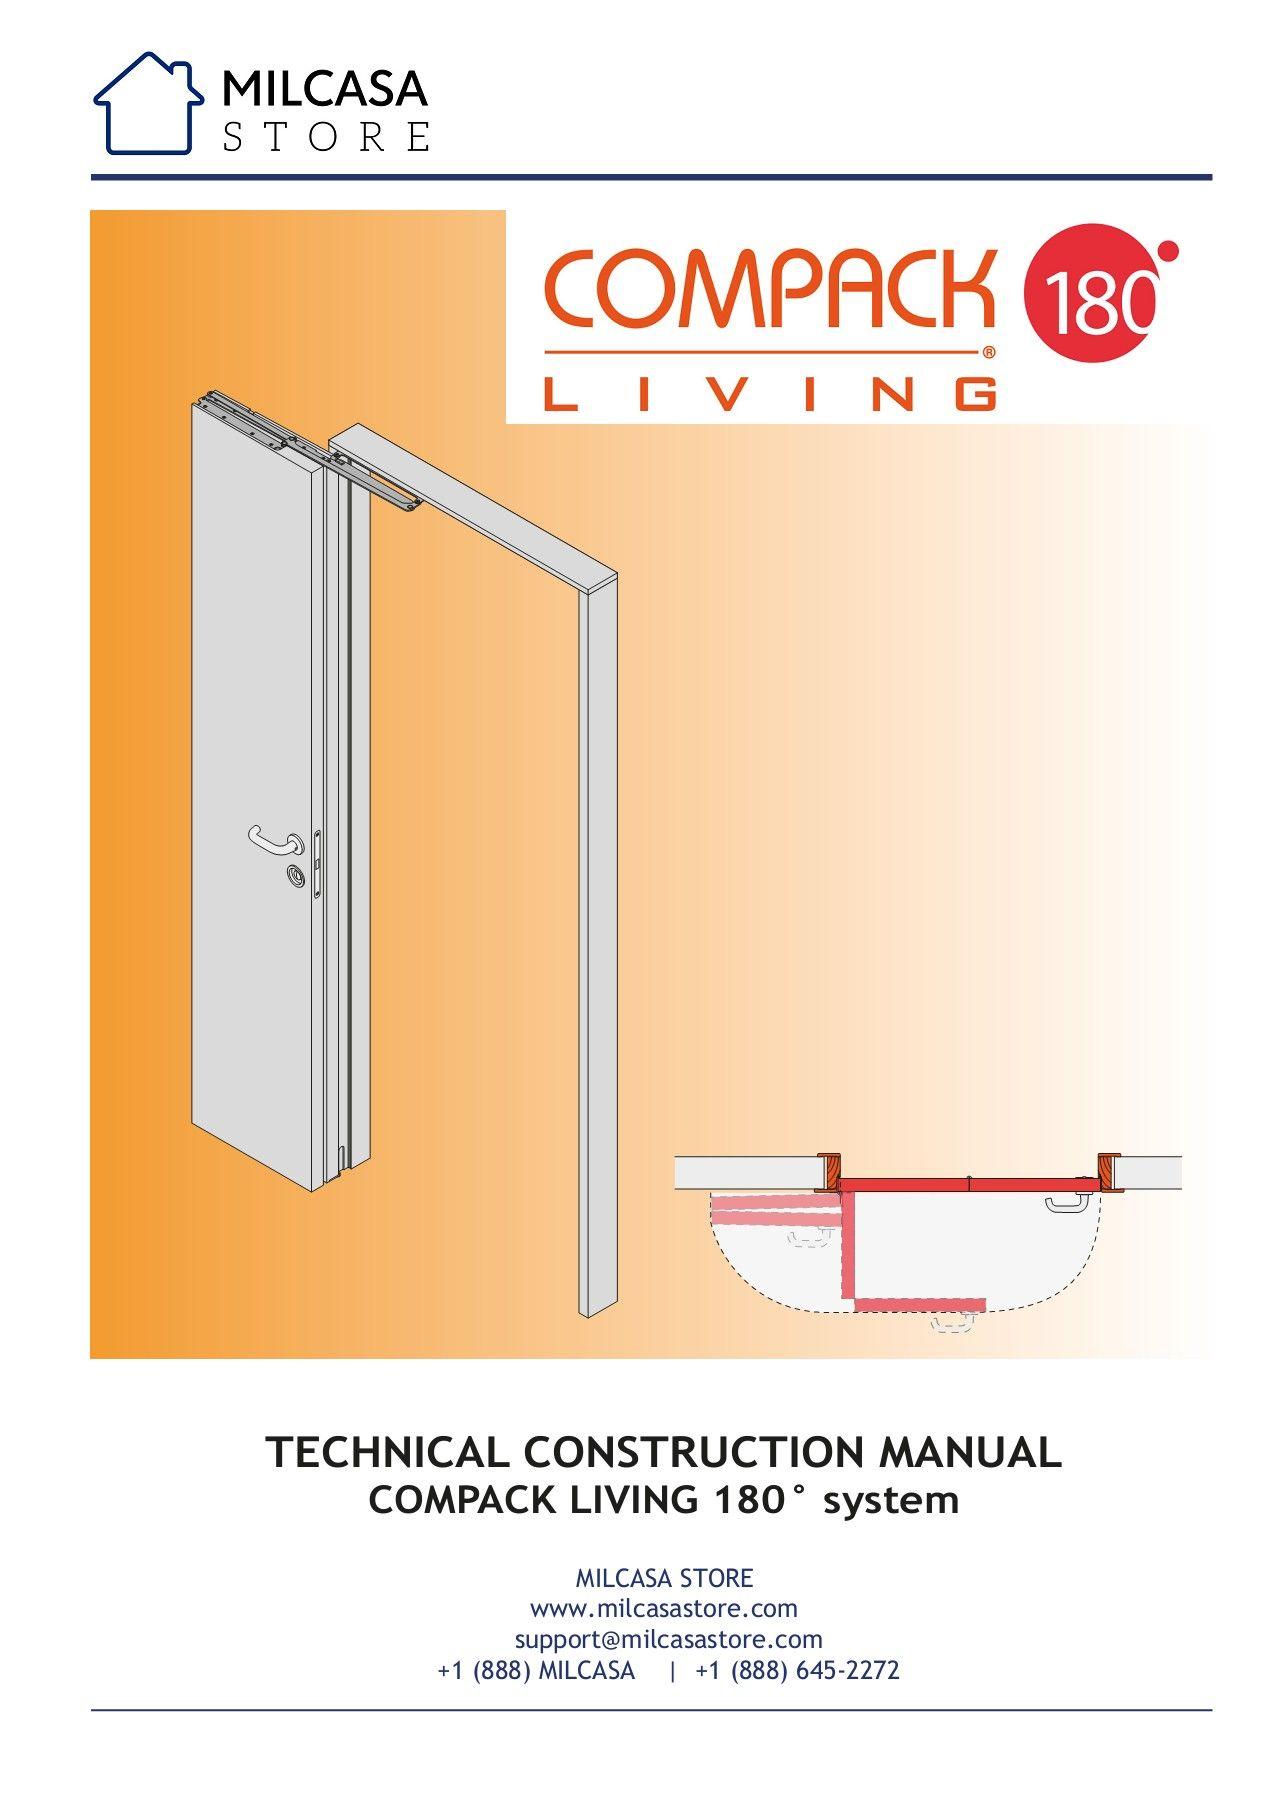 Compack Living 180 Installation Instructions Milcasa Store In 2020 Door Fittings Door Design Interior Room Partition Designs